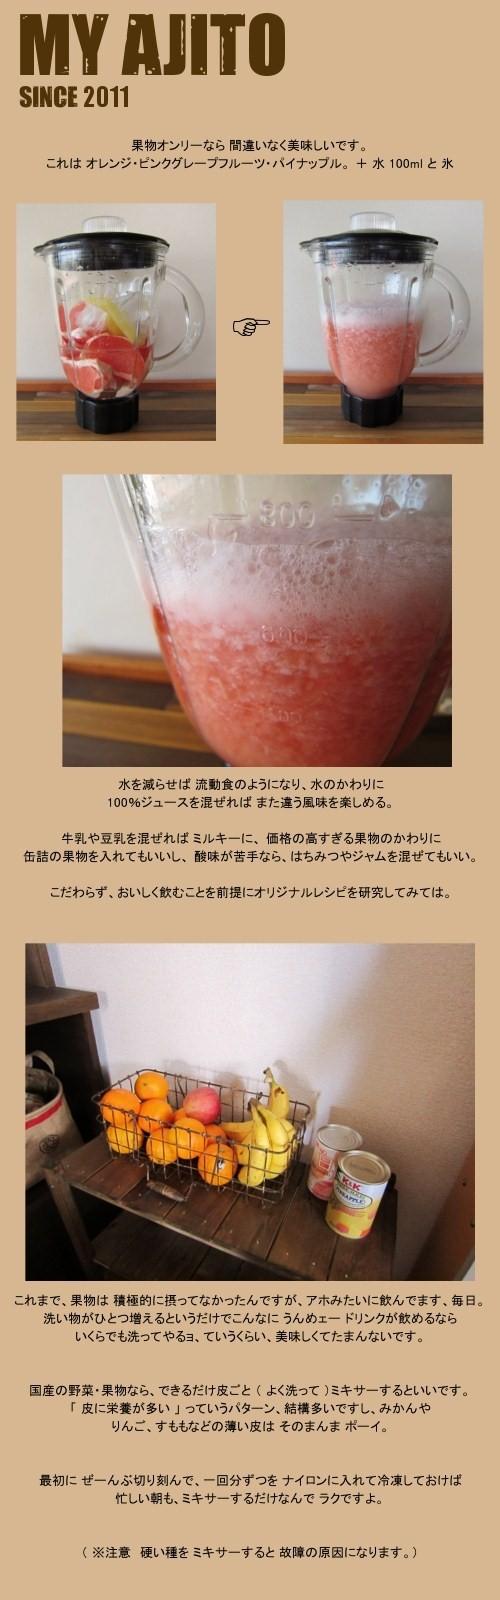 namaju_04.jpg